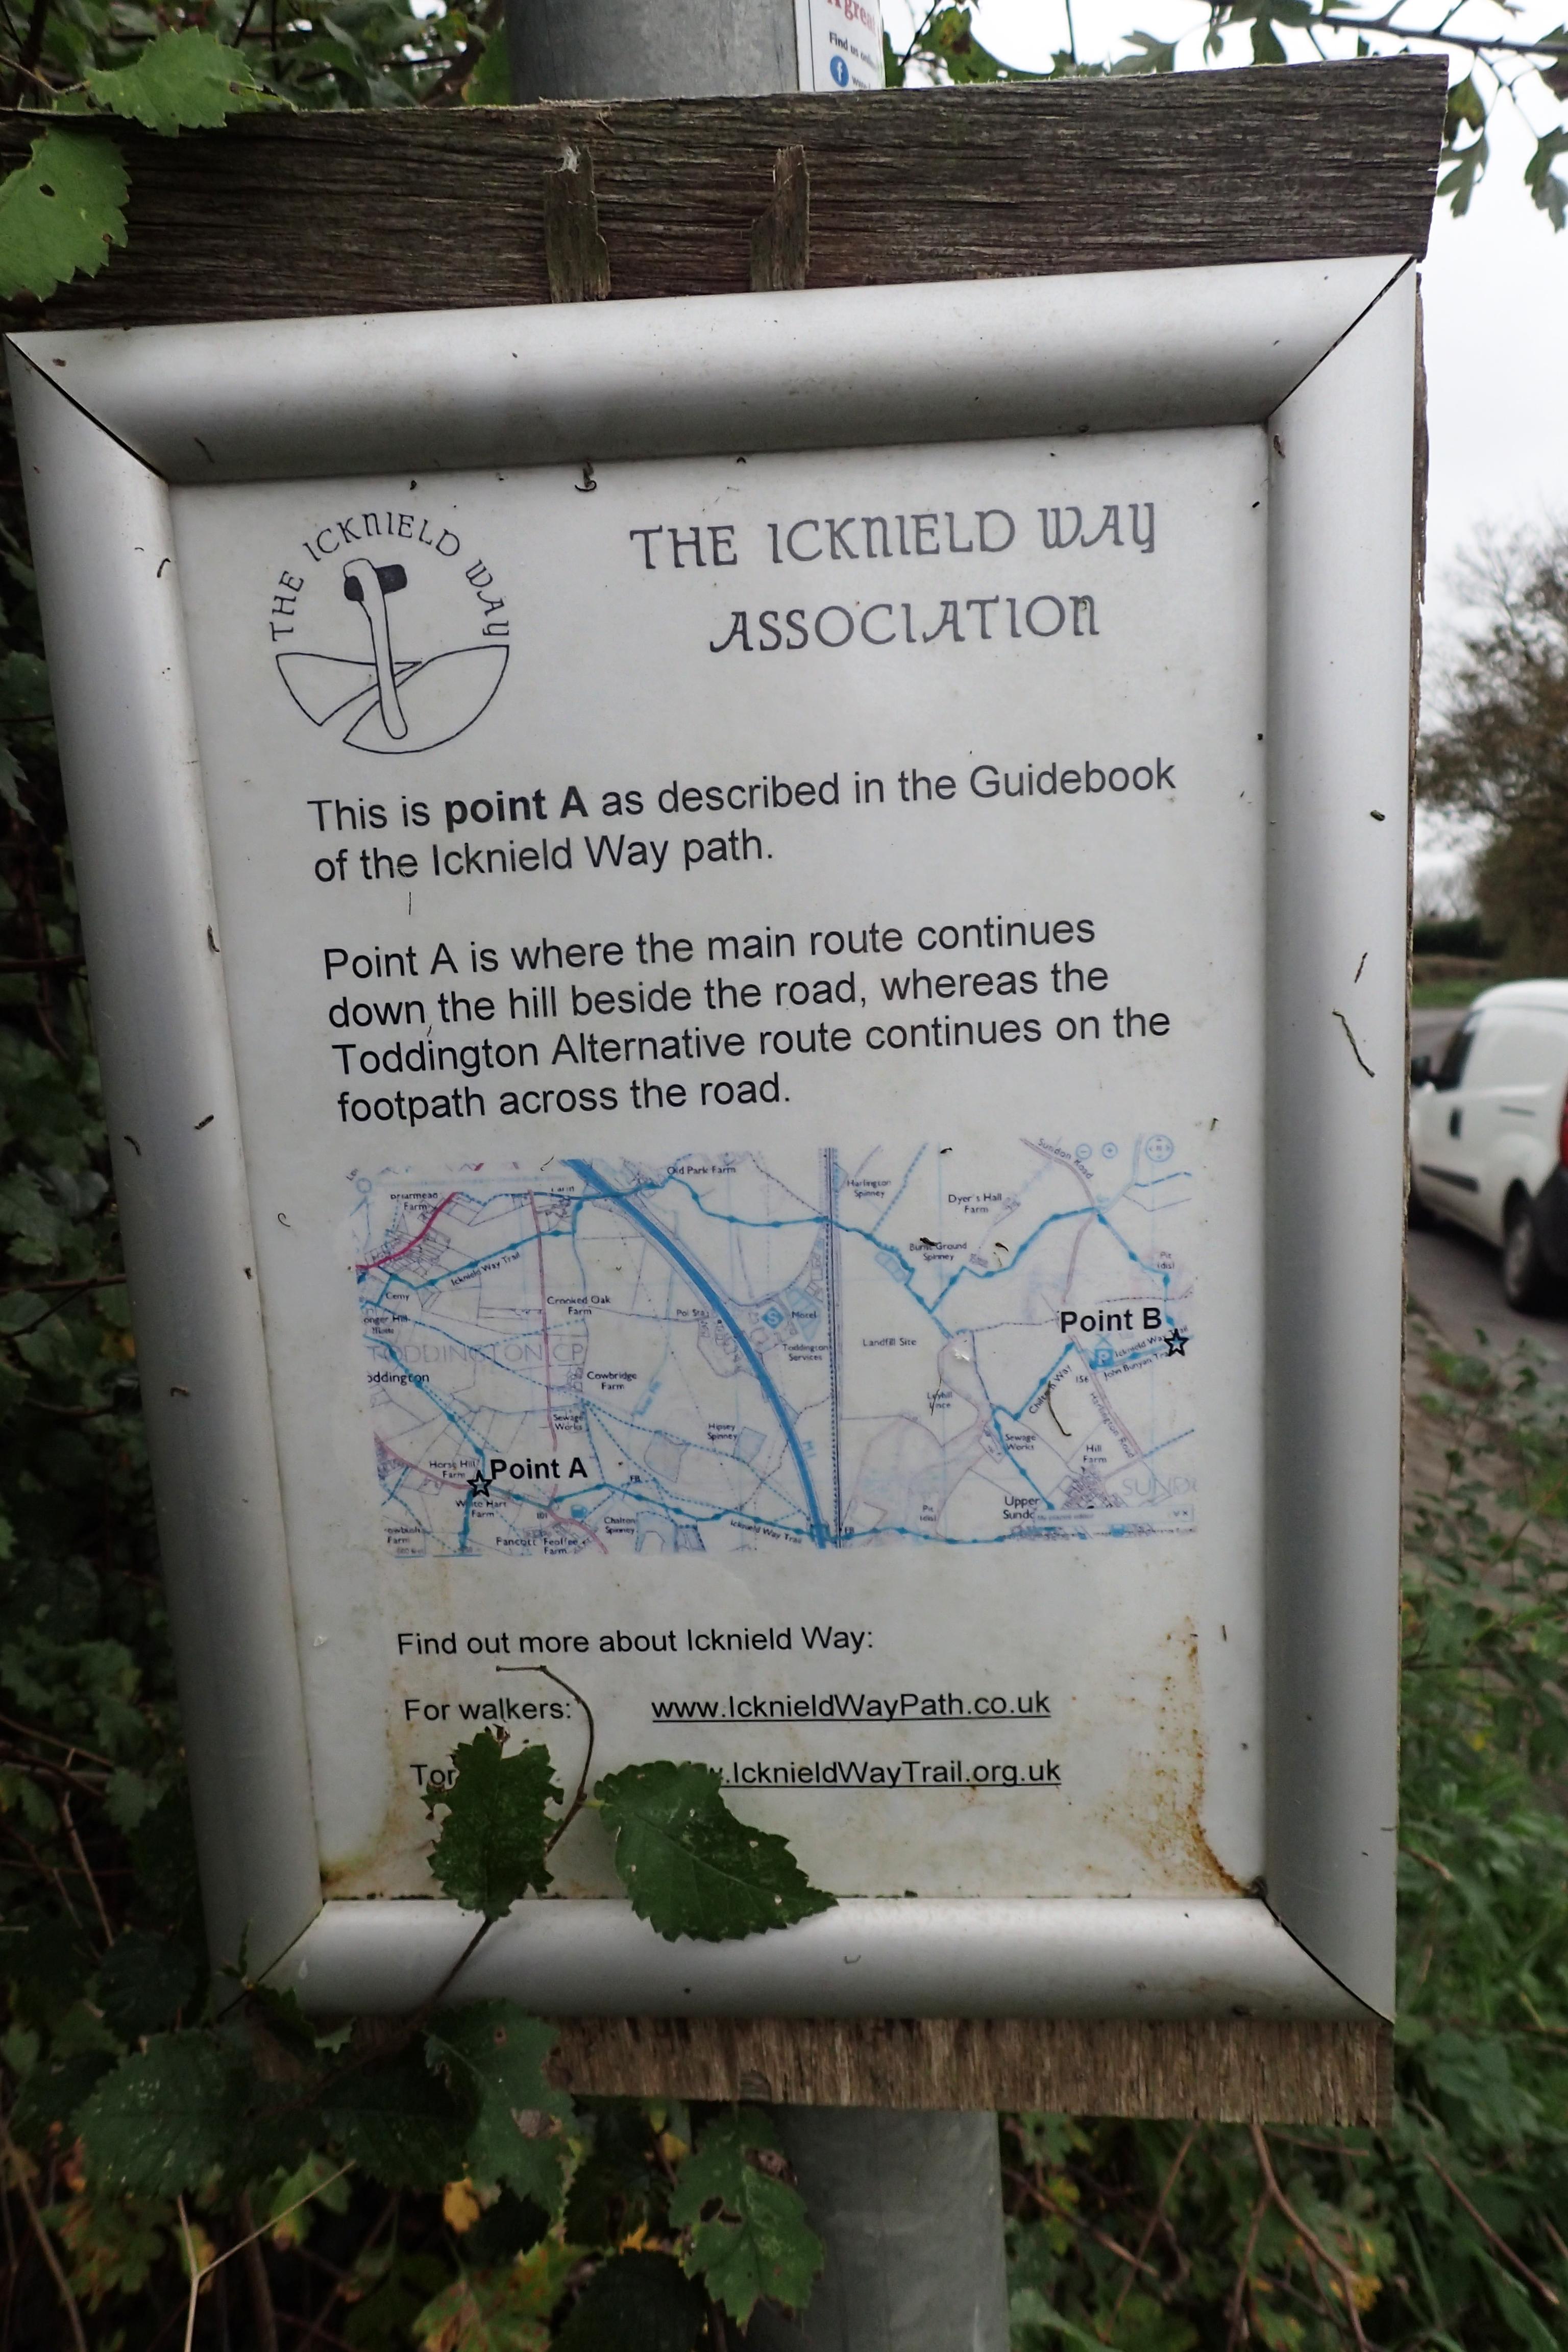 An alternative route passes through Toddington